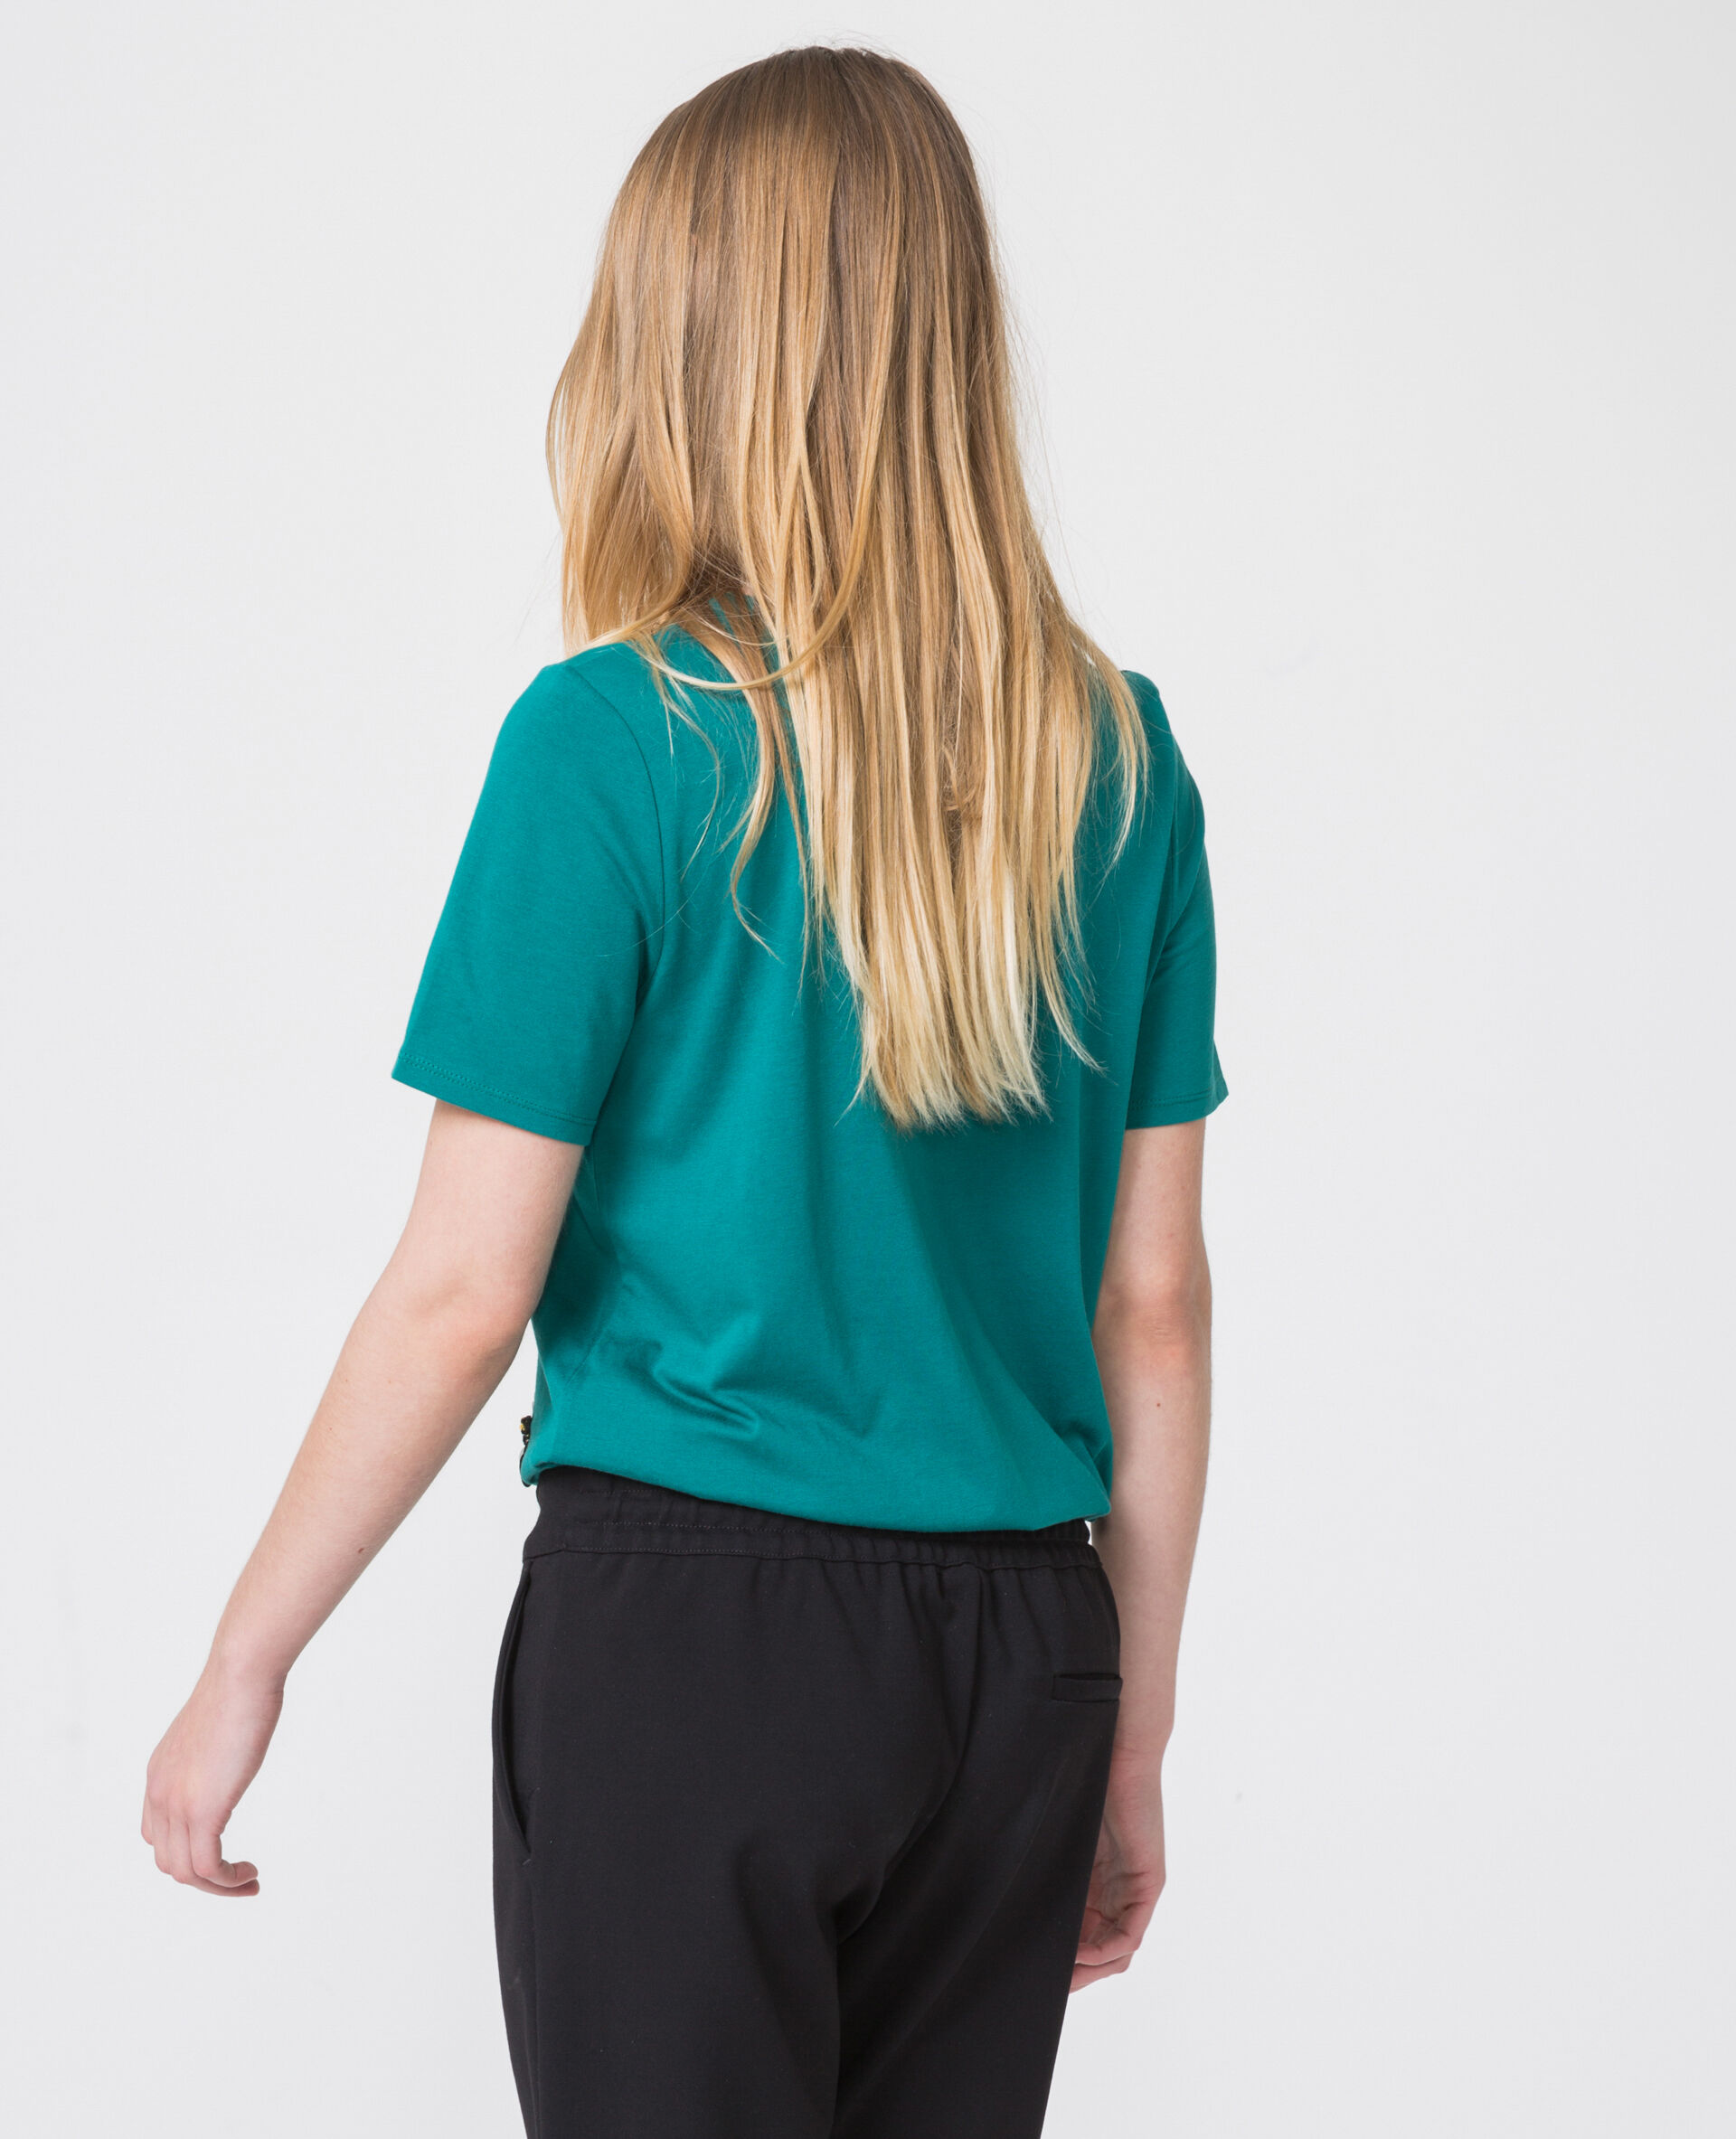 verde 409500C53F4A con perle T Pimkie shirt nwqF66R1g